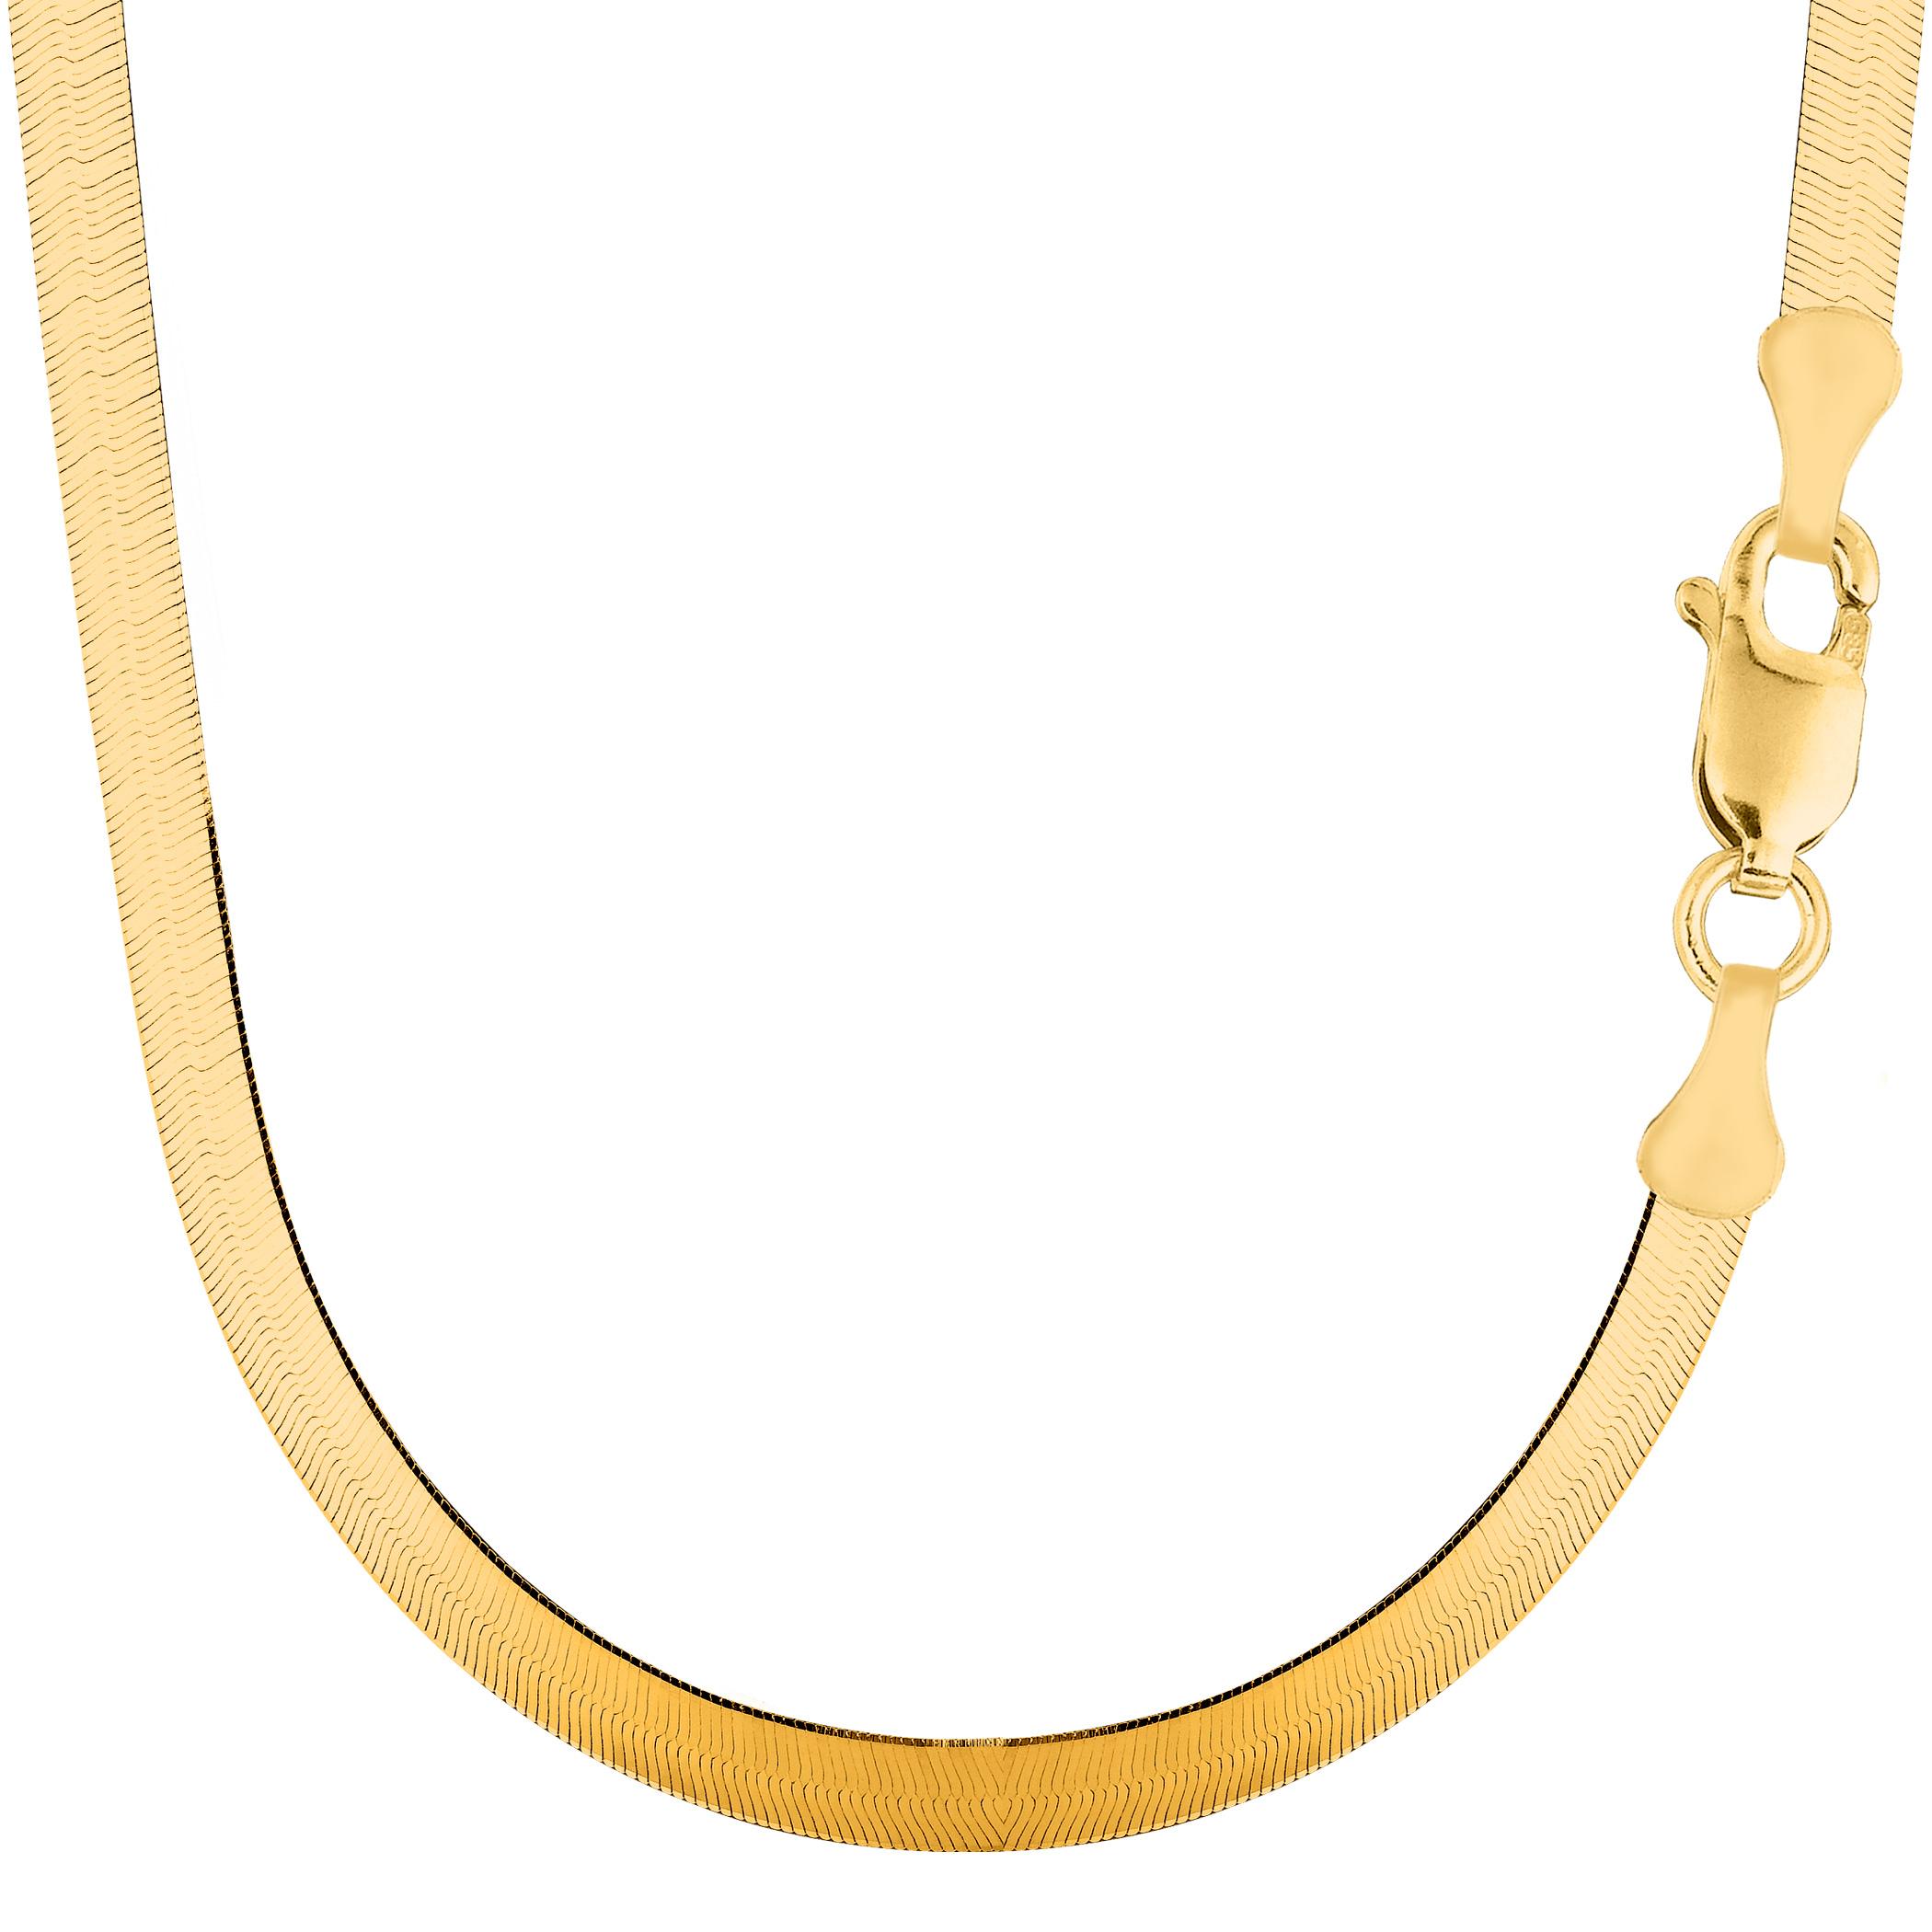 16 Inch Gold Herringbone Necklace: 14k Yellow Gold Imperial Herringbone Chain Width 5 0mm